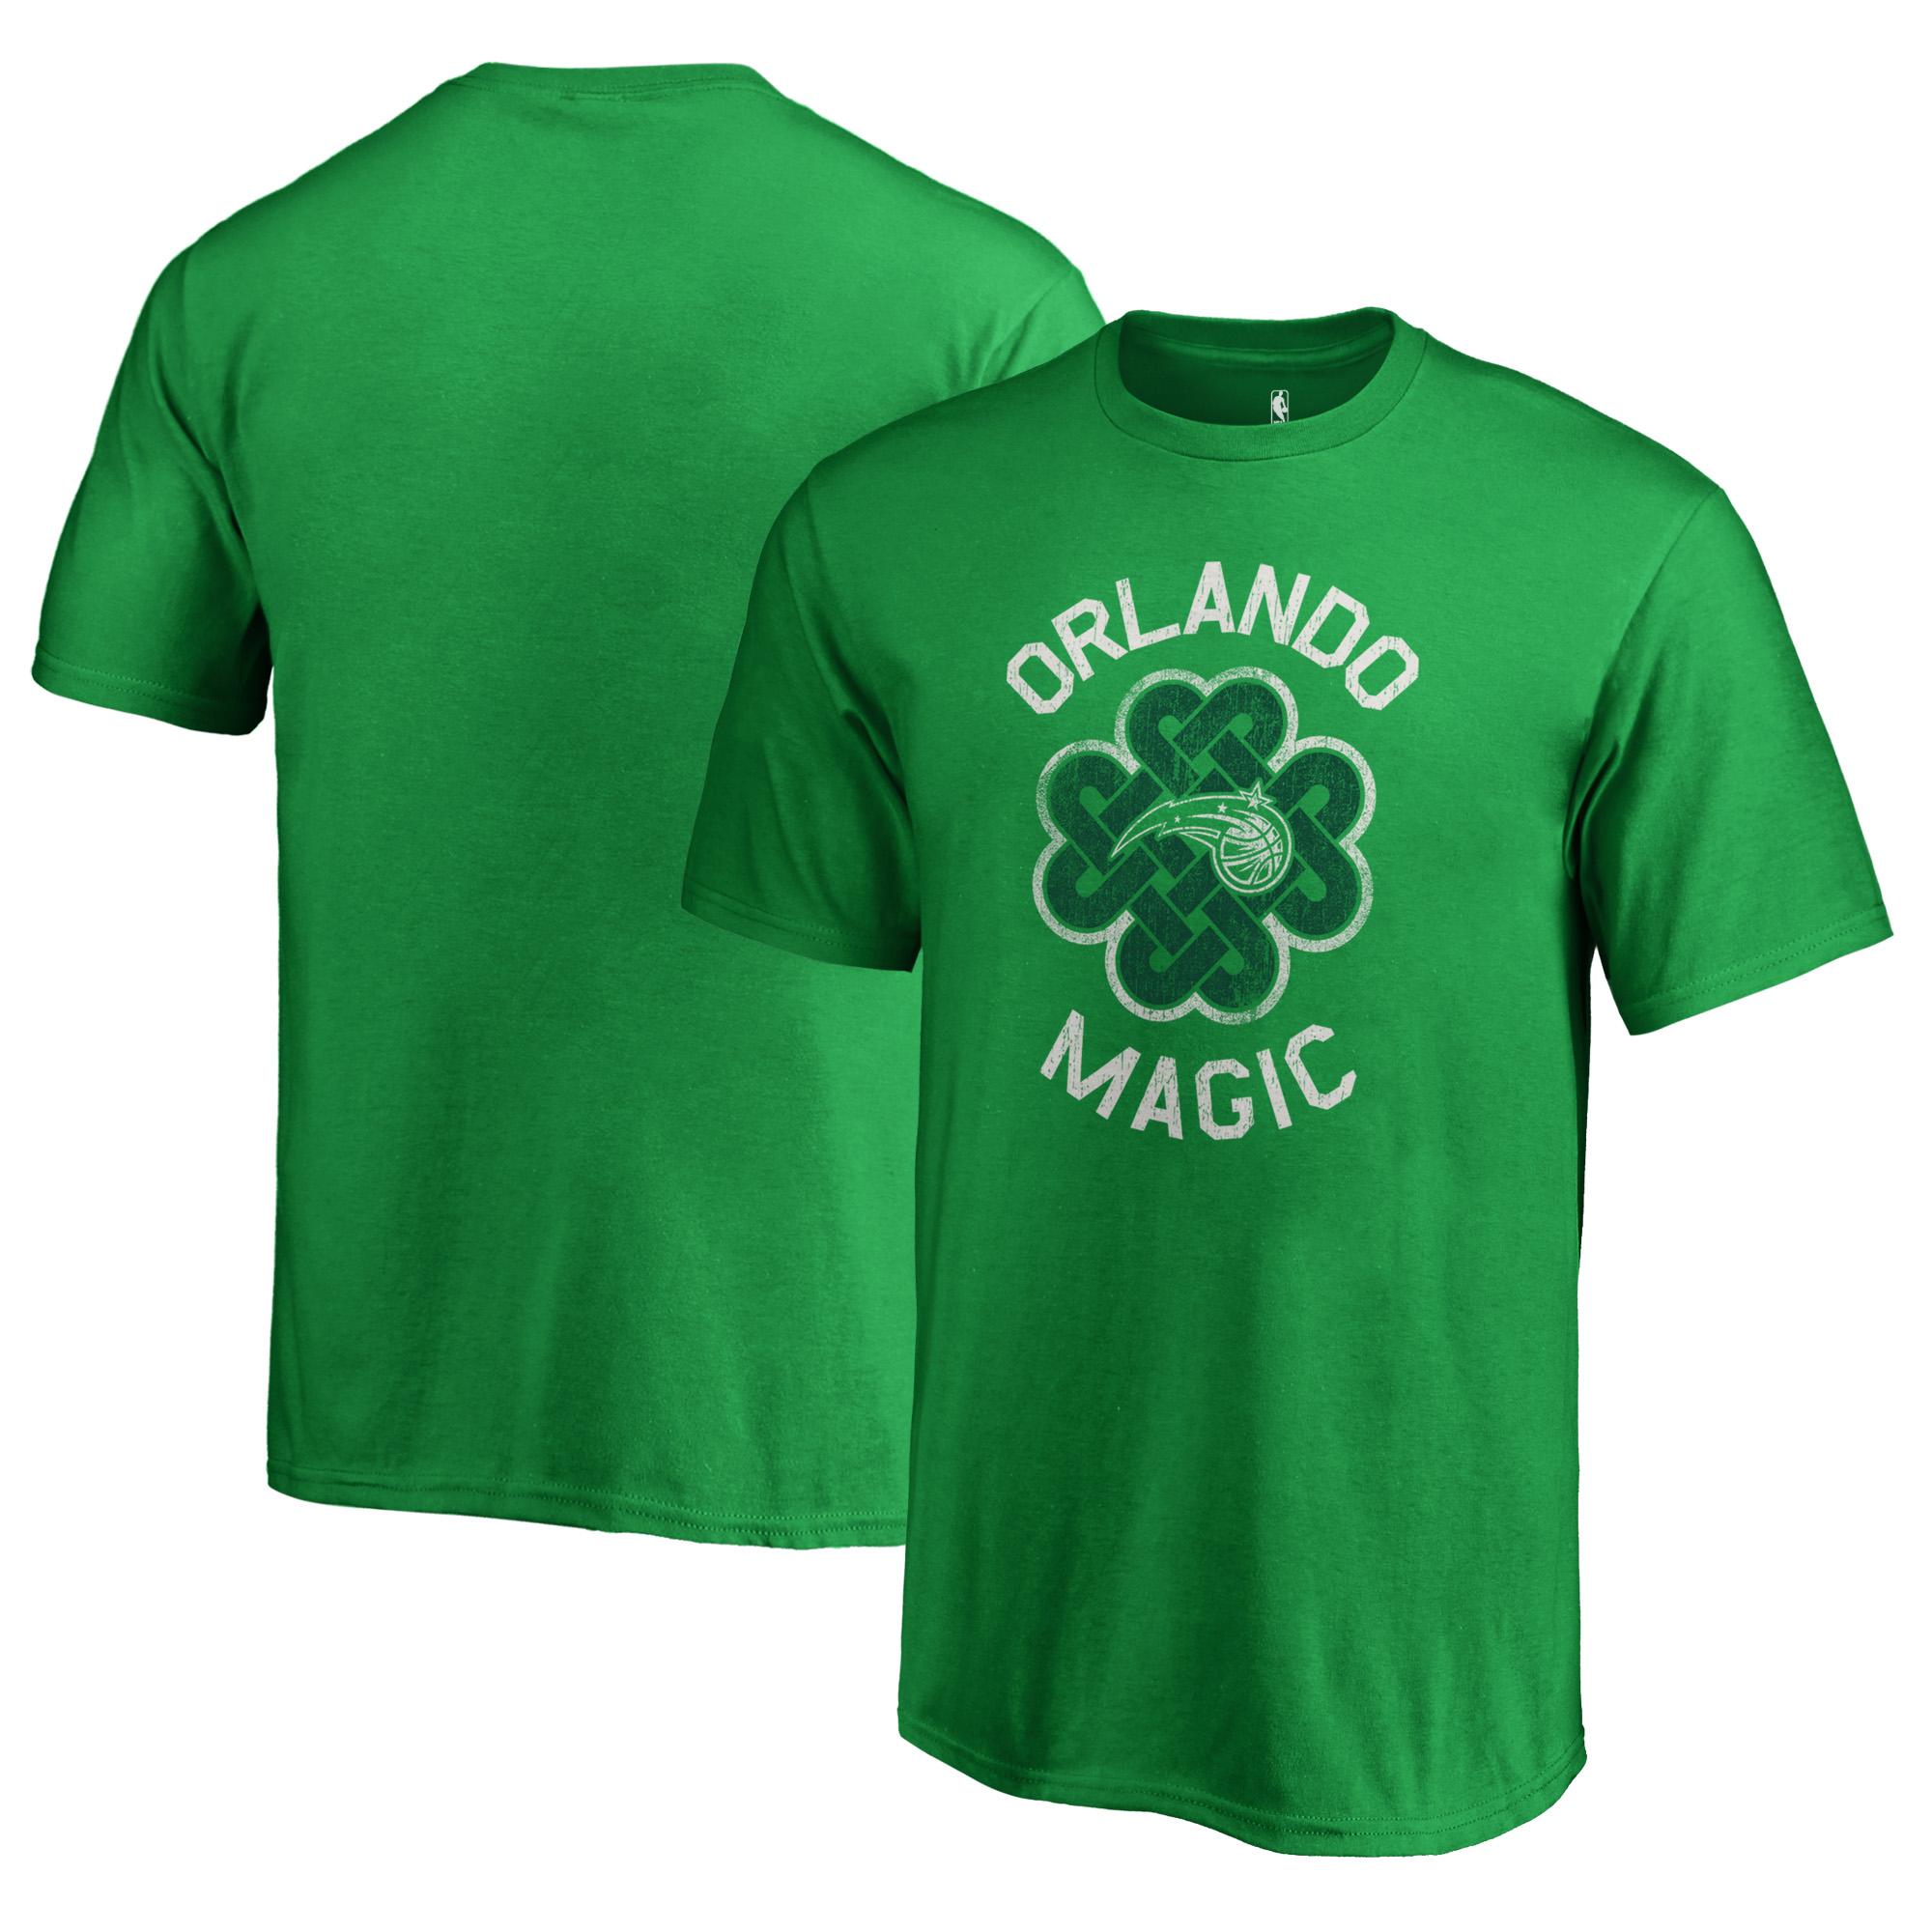 Orlando Magic Fanatics Branded Youth St. Patrick's Day Luck Tradition T-Shirt - Kelly Green